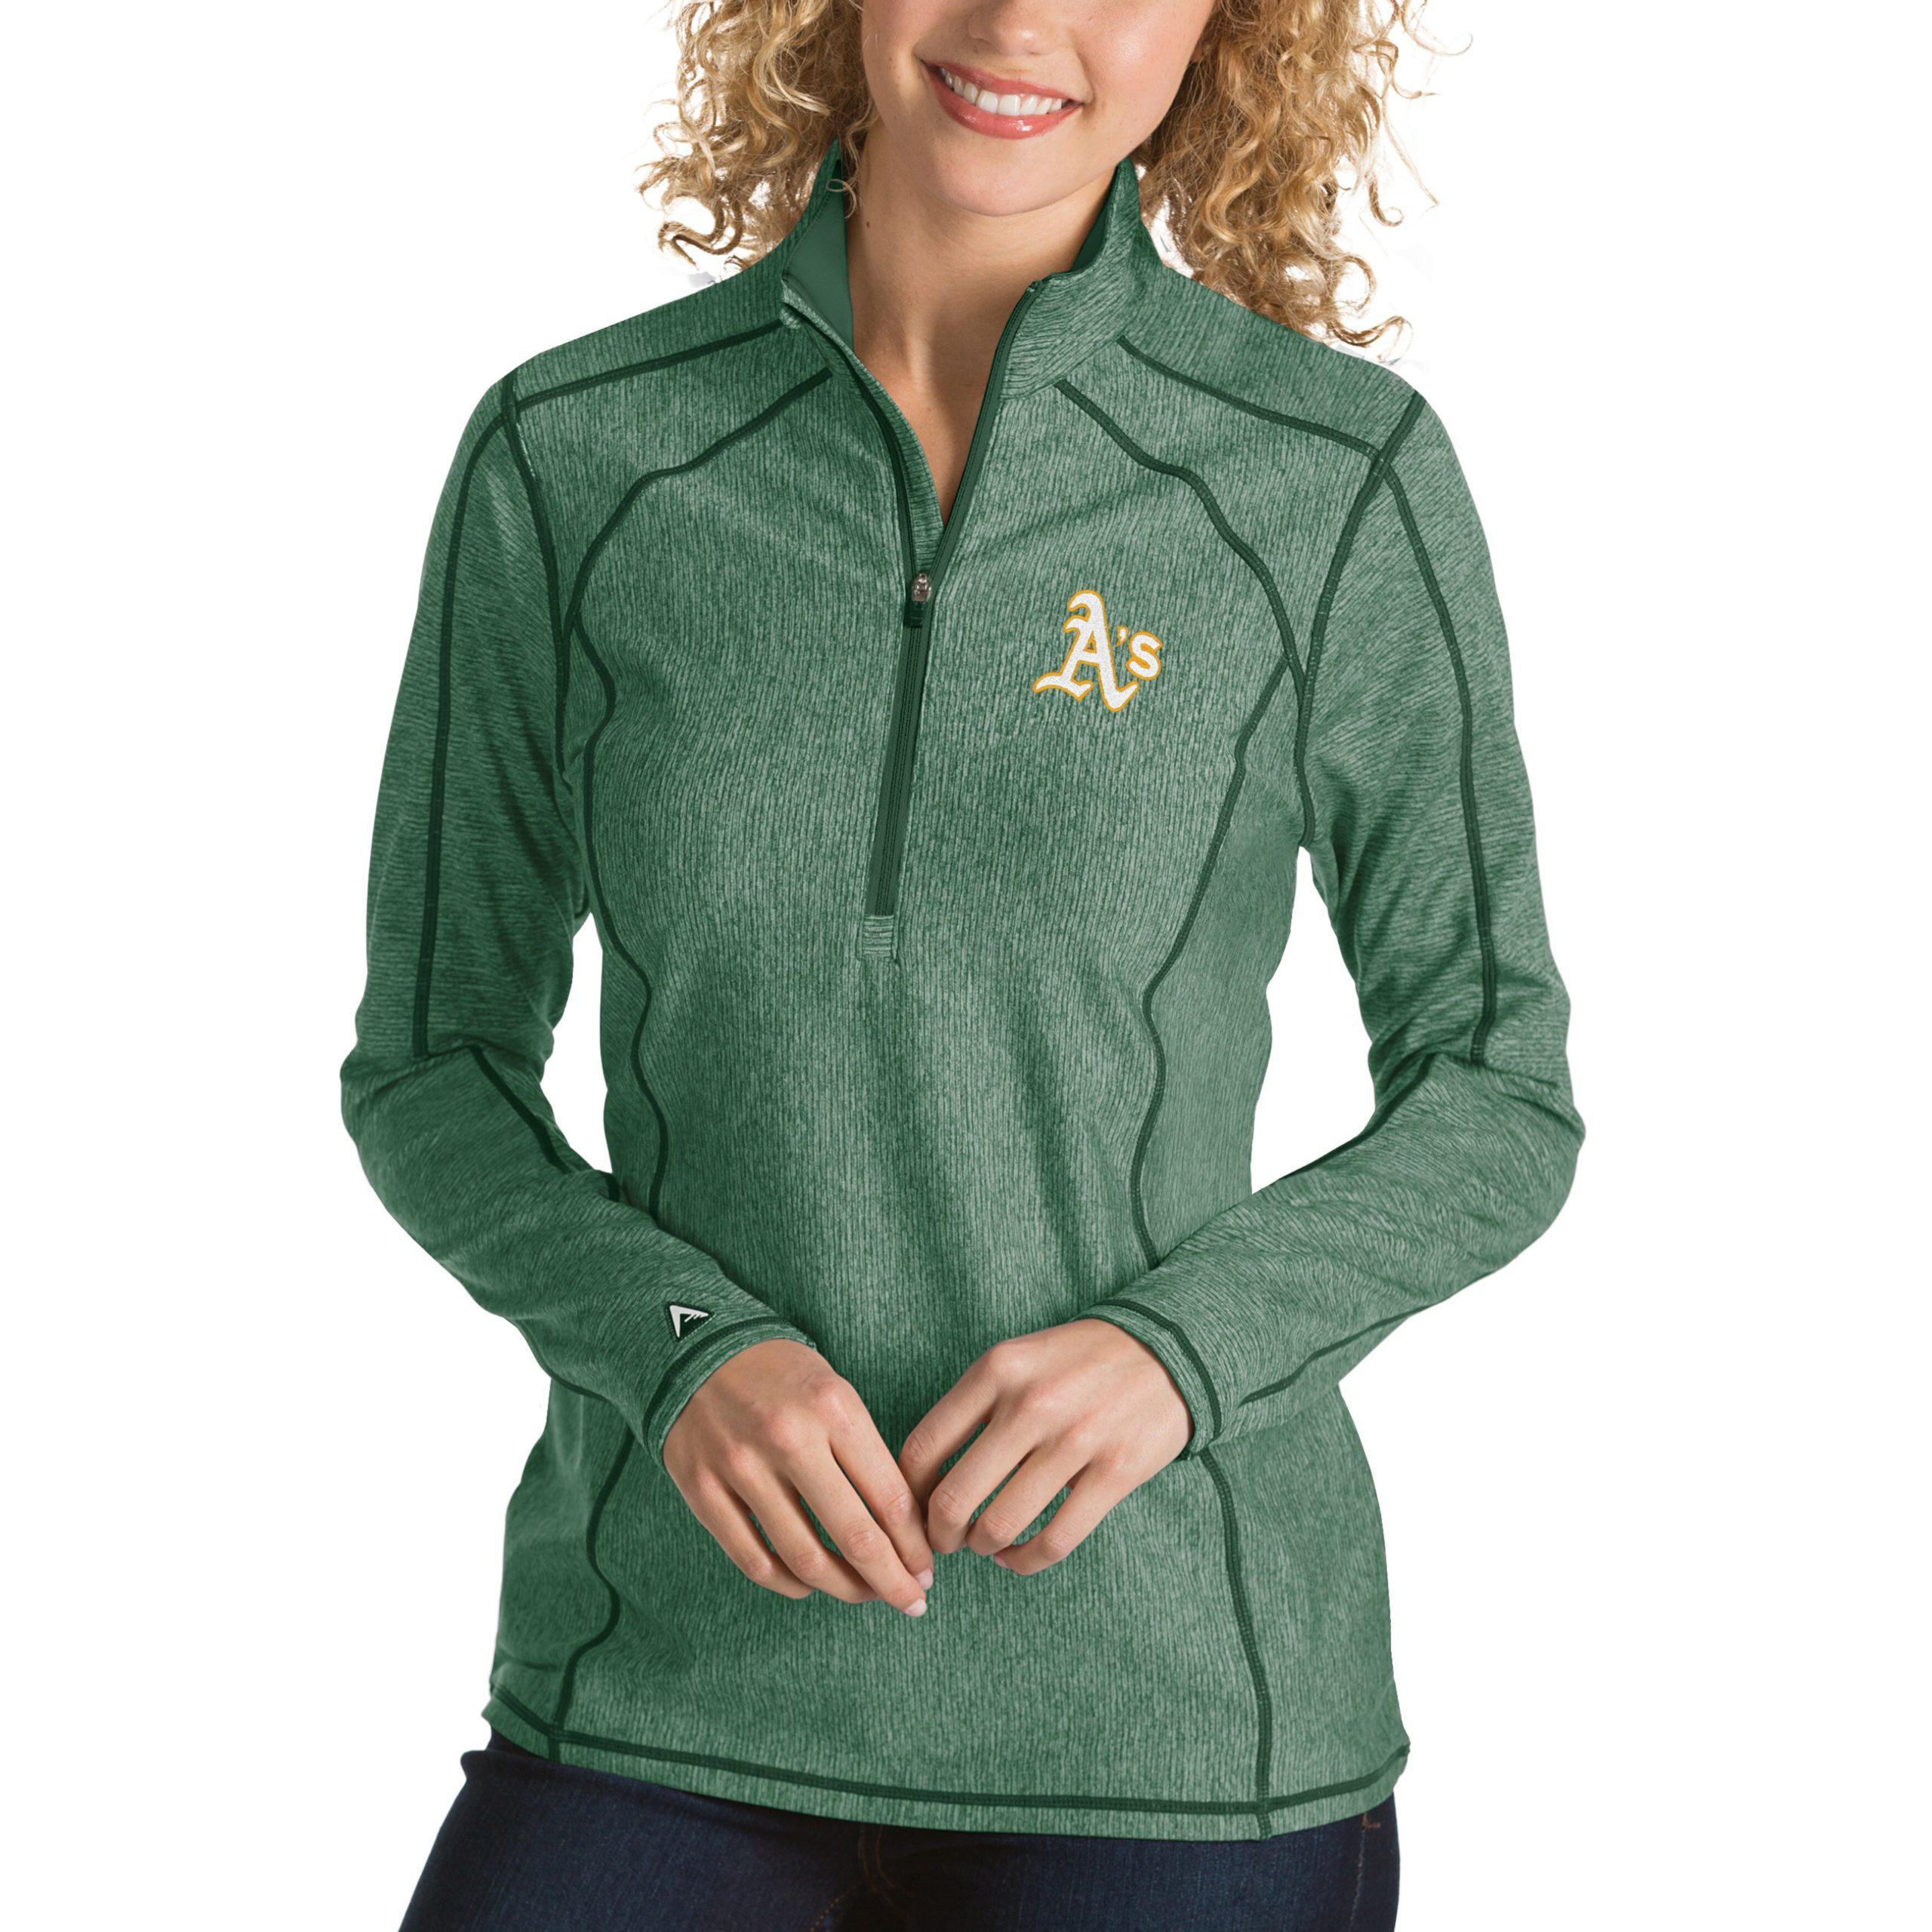 Oakland Athletics Antigua Women's Tempo Desert Dry 1/4-Zip Pullover Jacket - Heathered Green